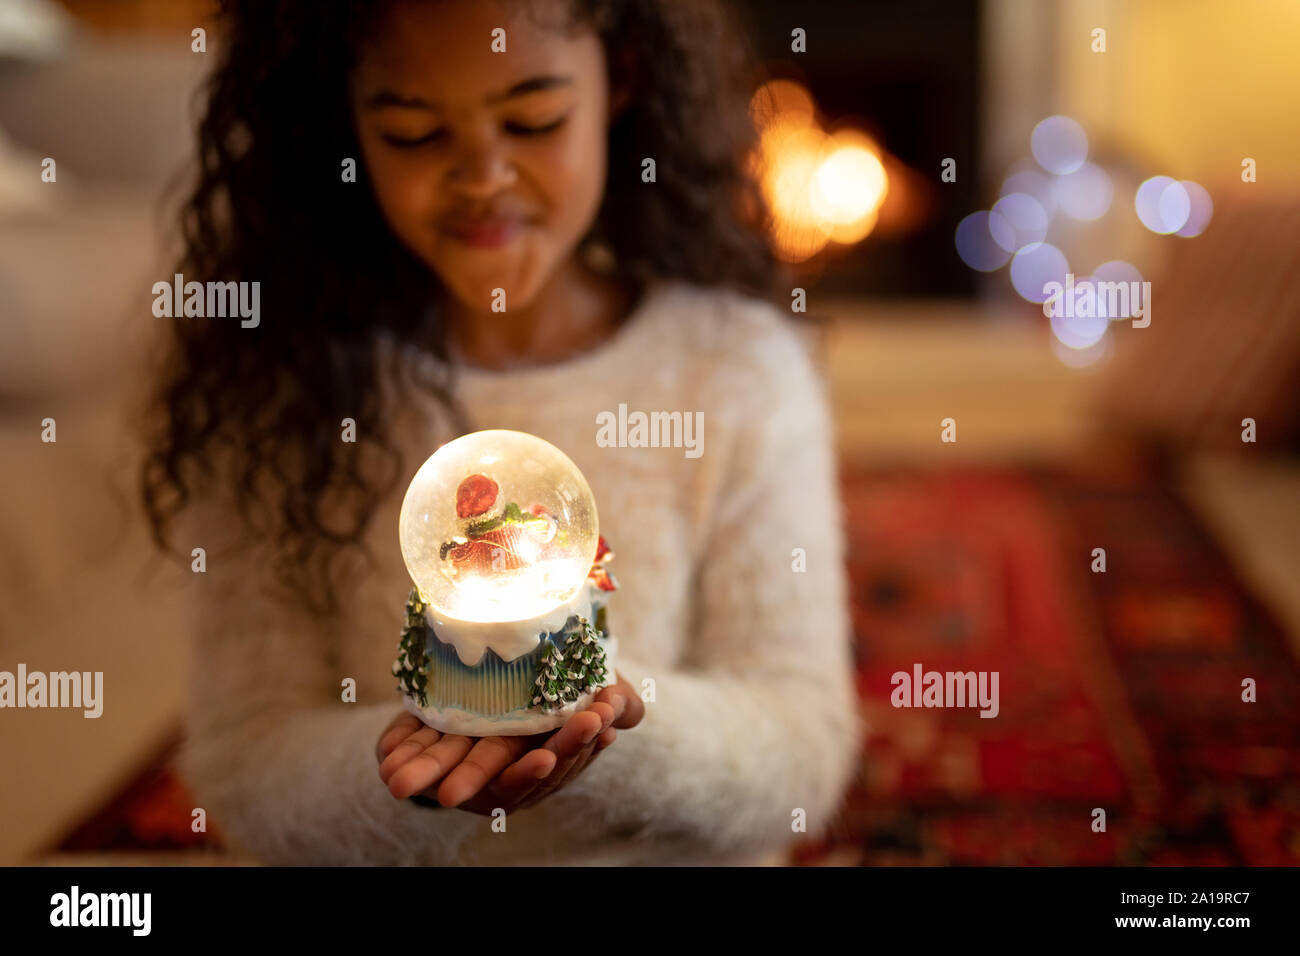 Girl at home at Christmas time Stock Photo